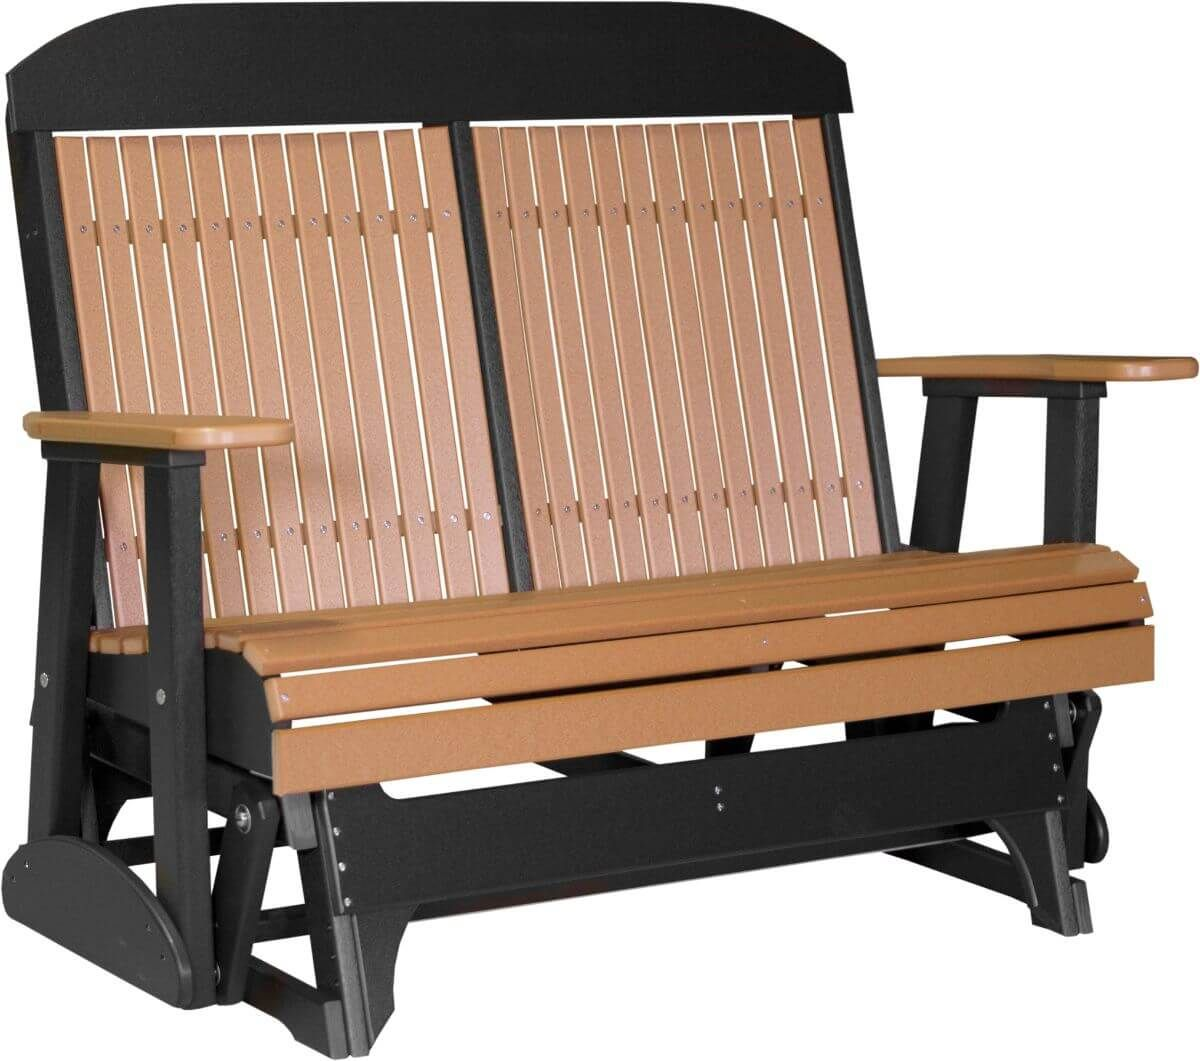 Cedar and Black Stockton Outdoor Glider Bench